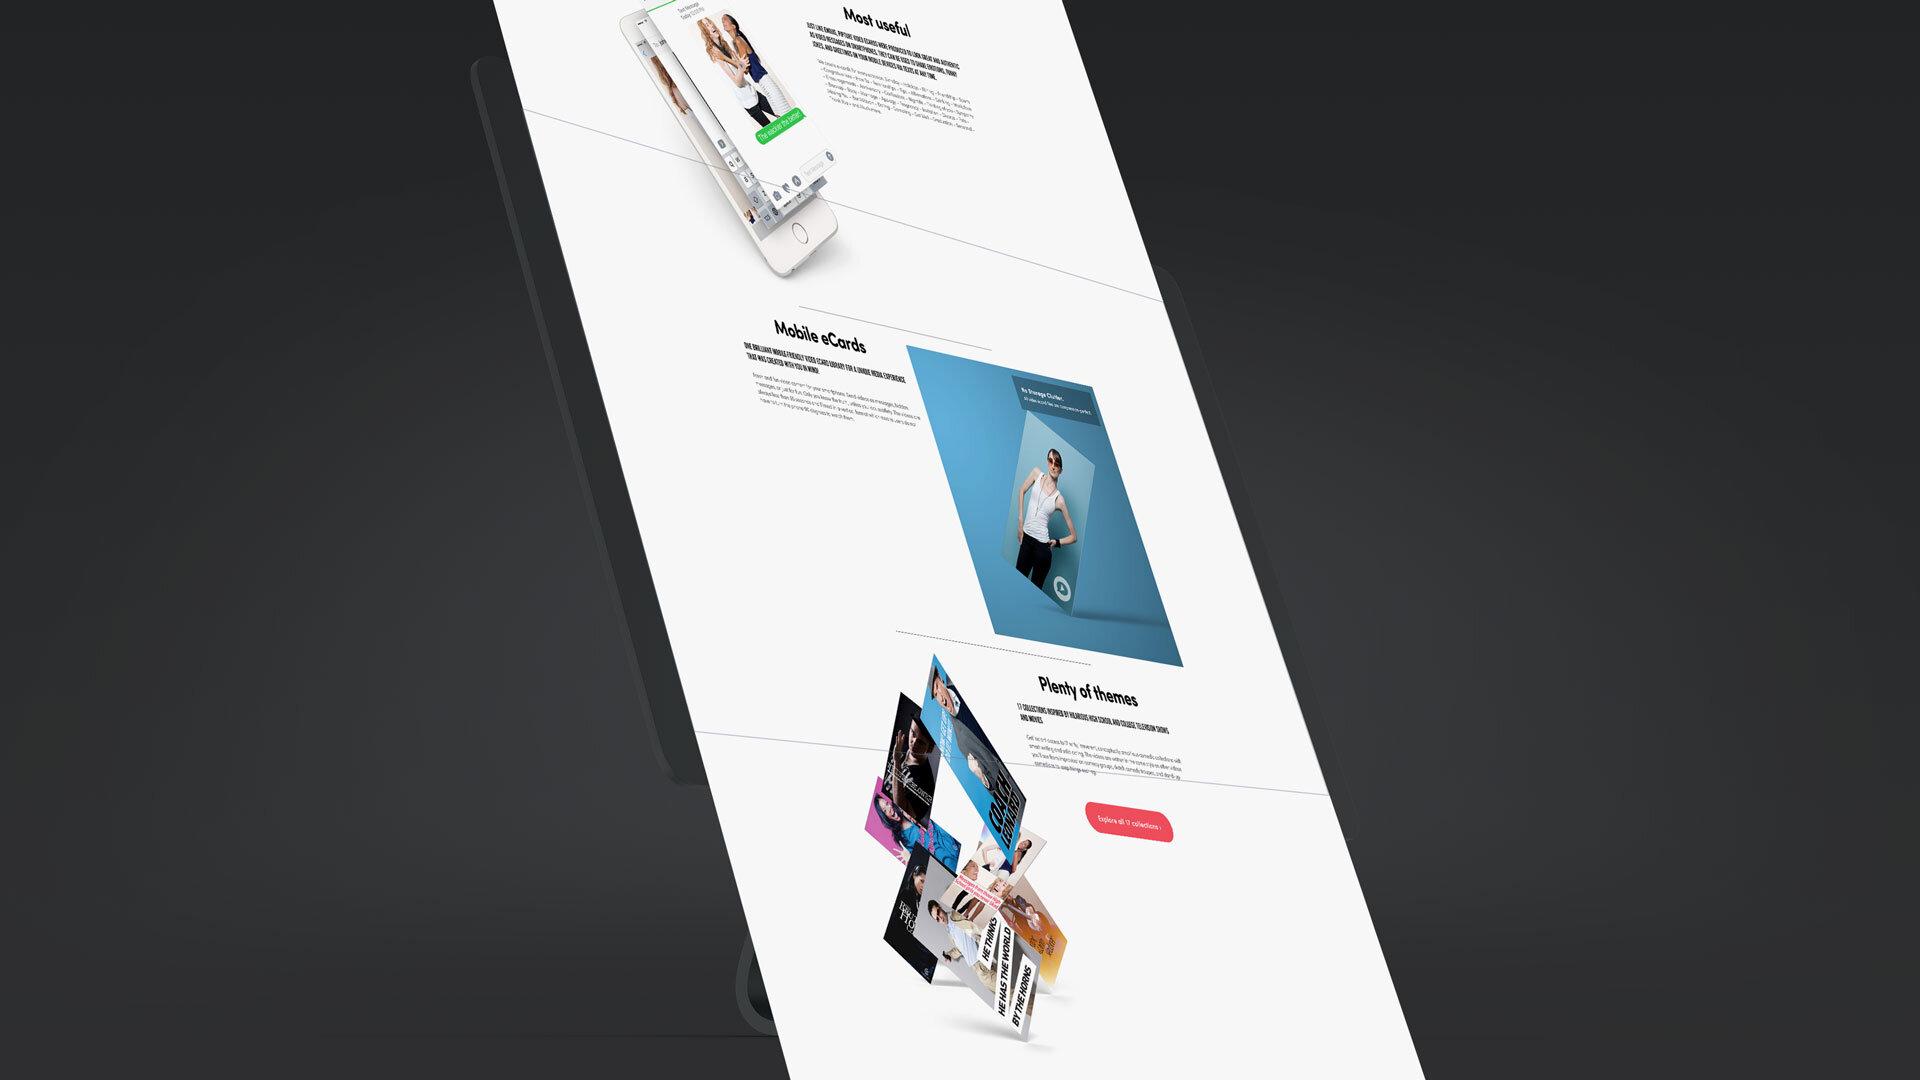 Pipture-Website-iMac5K-all-1920.jpg